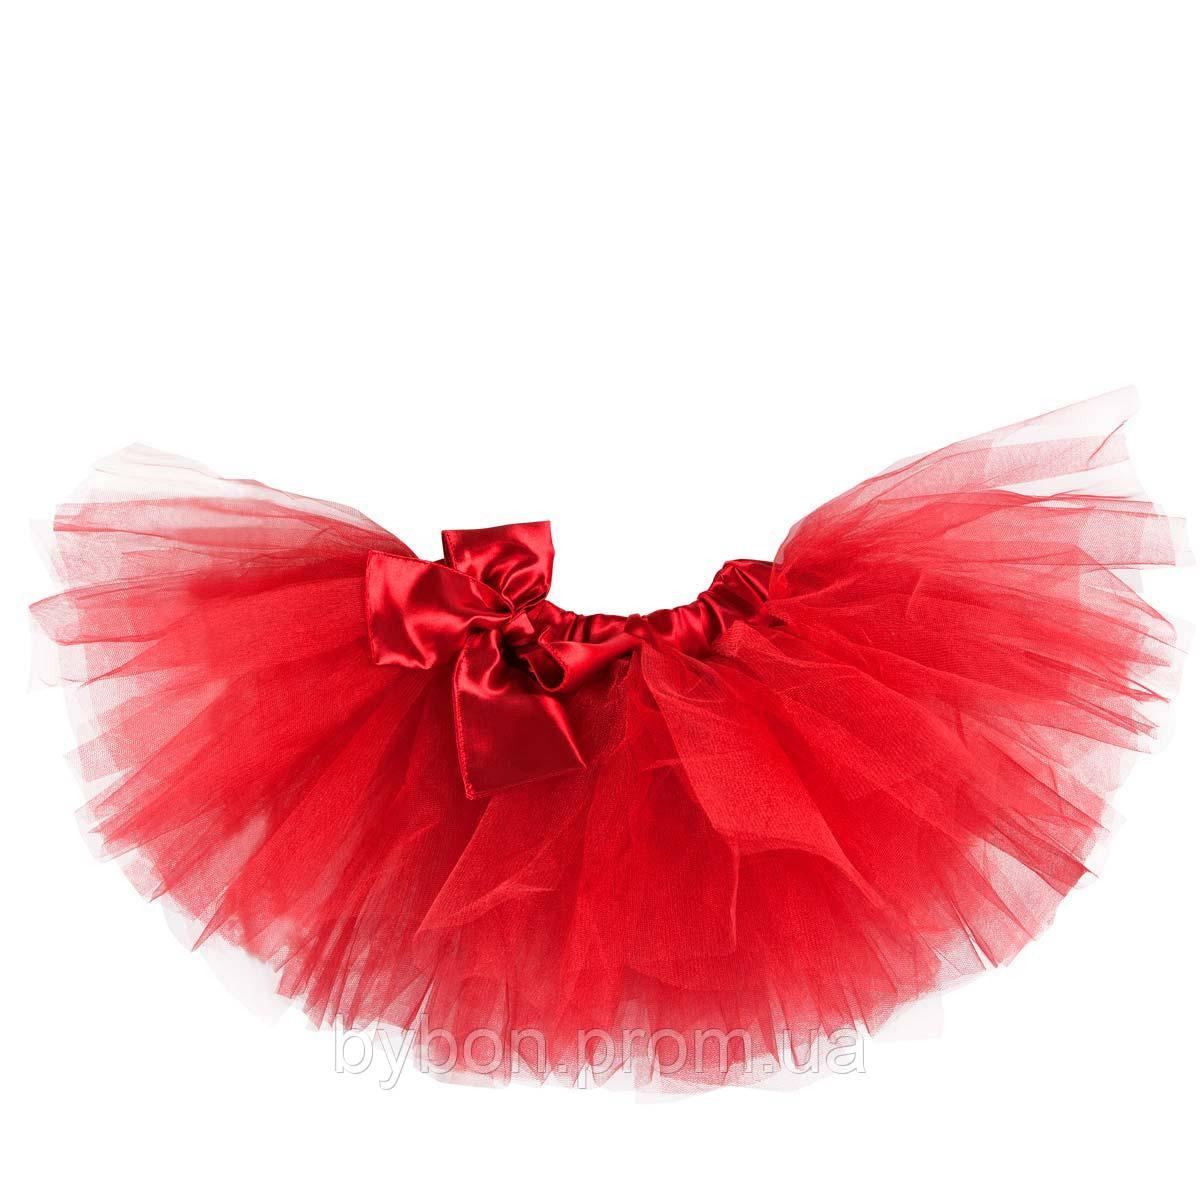 Красная юбка туту 17